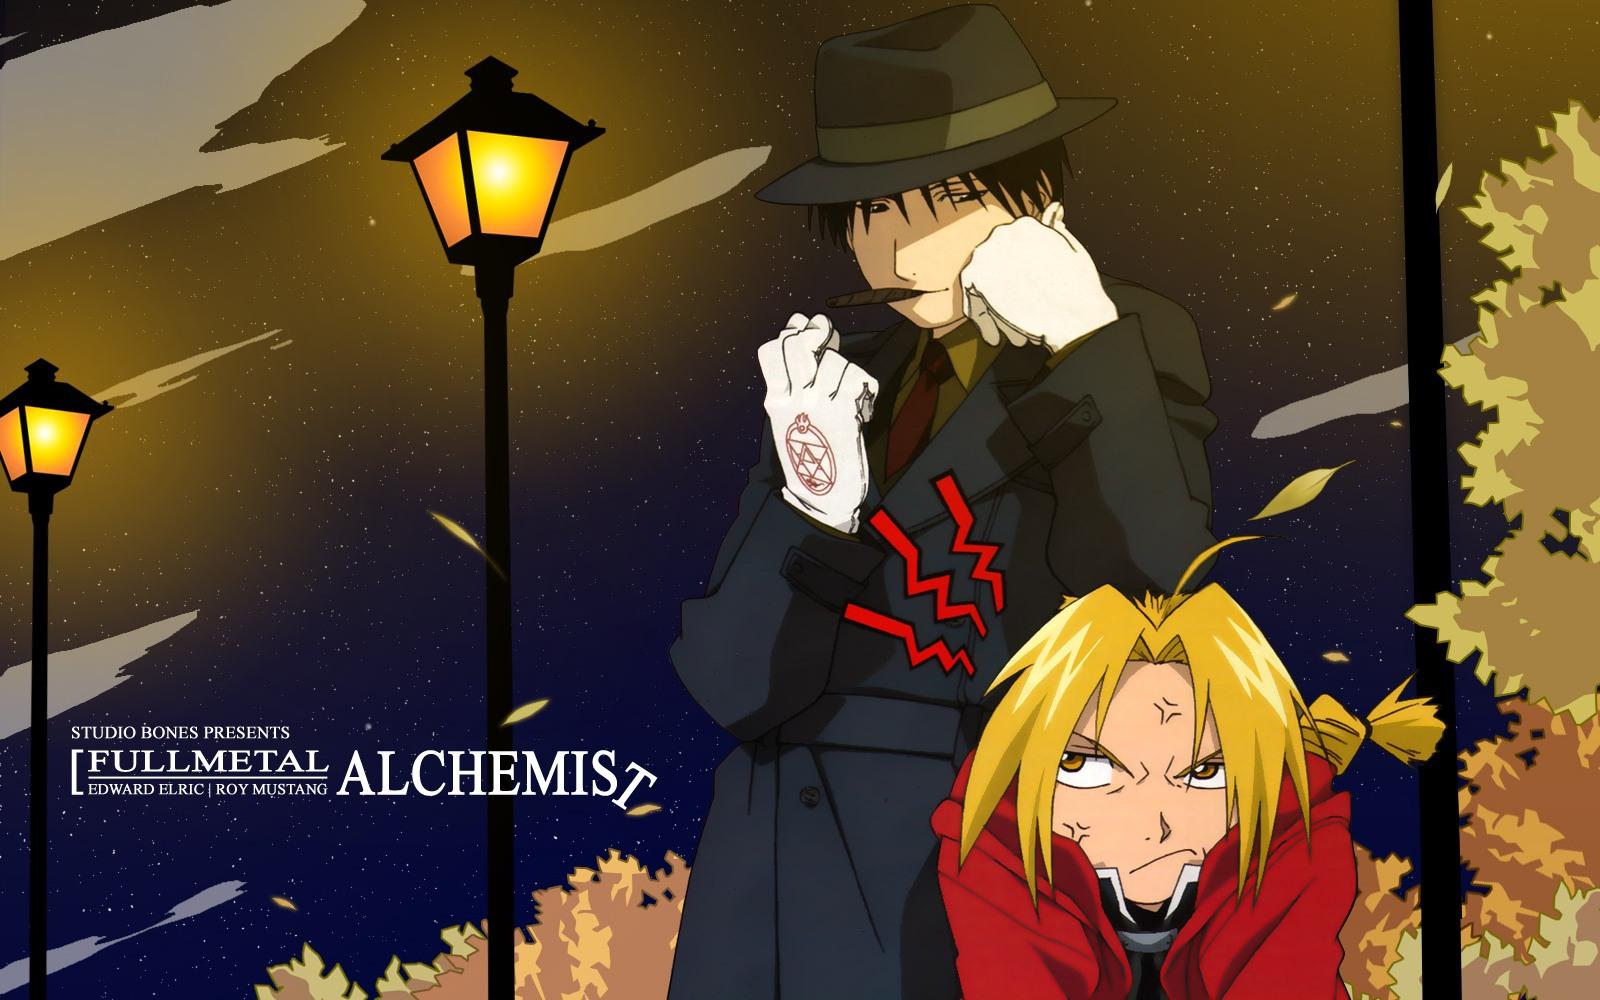 fullmetal alchemist roy mustang wallpaper HQ WALLPAPER   179148 1600x1000